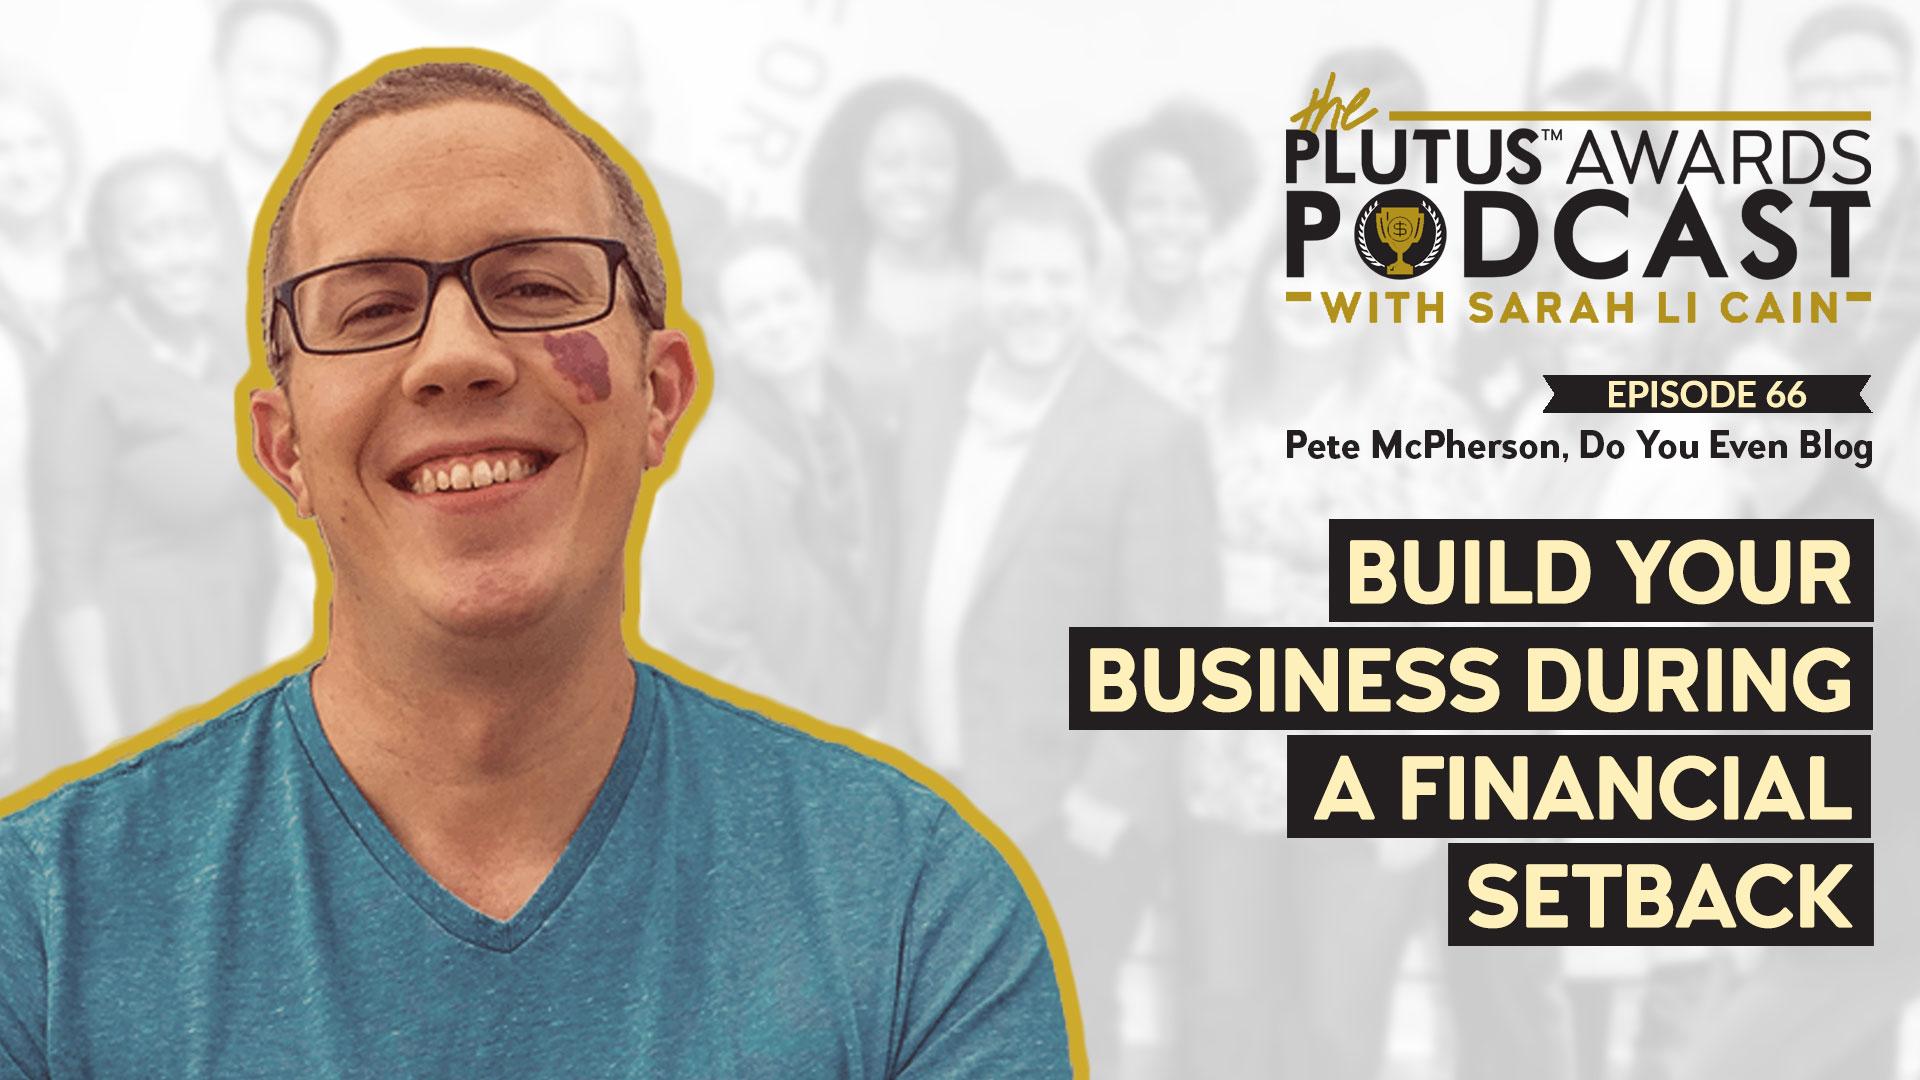 Plutus Awards Podcast - Pete McPherson Featured Image